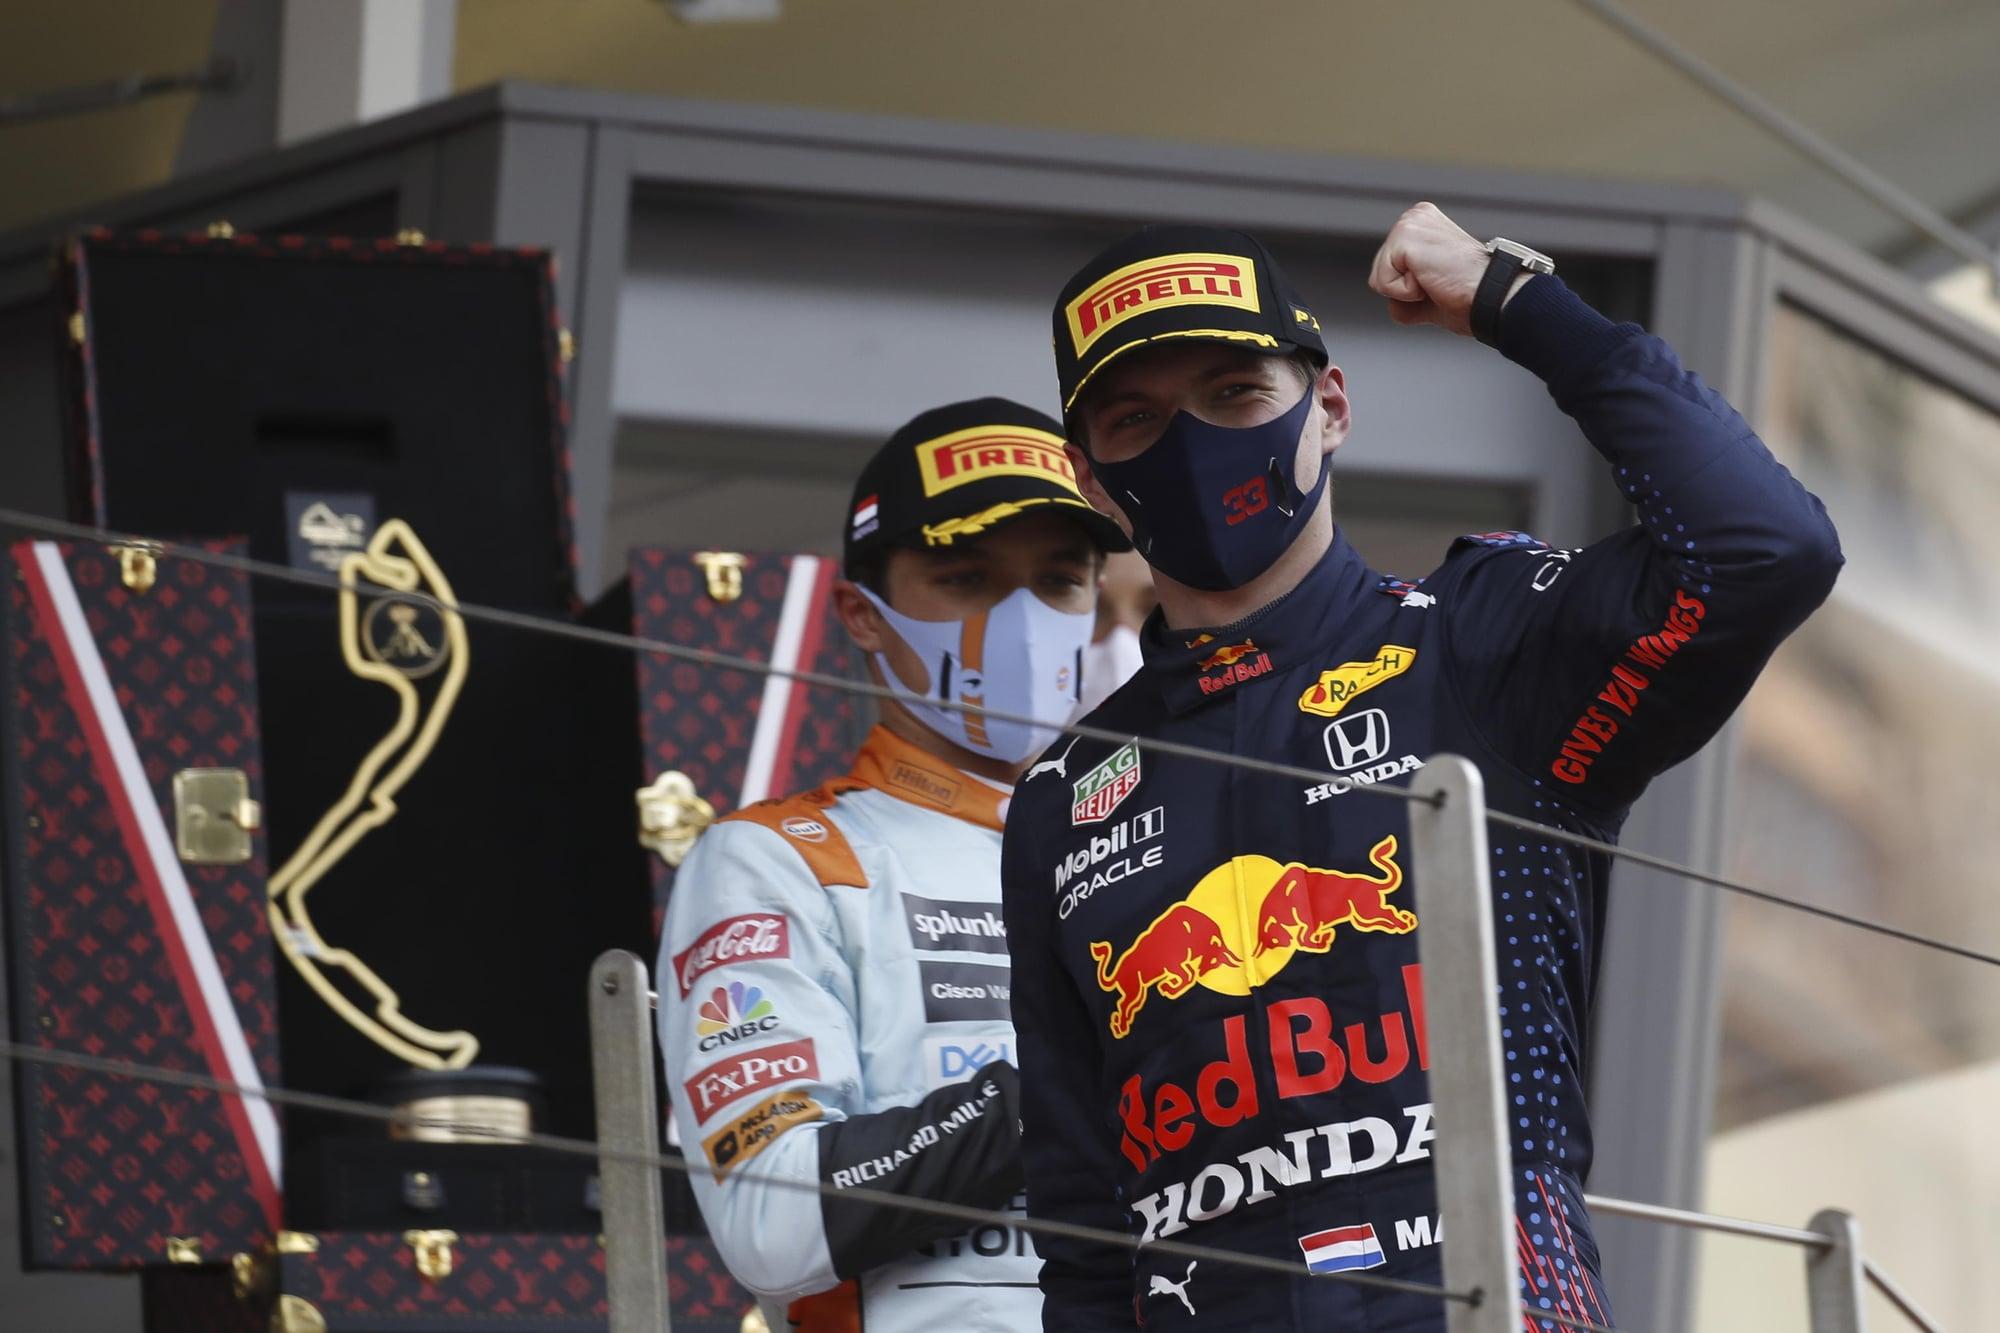 F1 Gp Monaco, Verstappen: